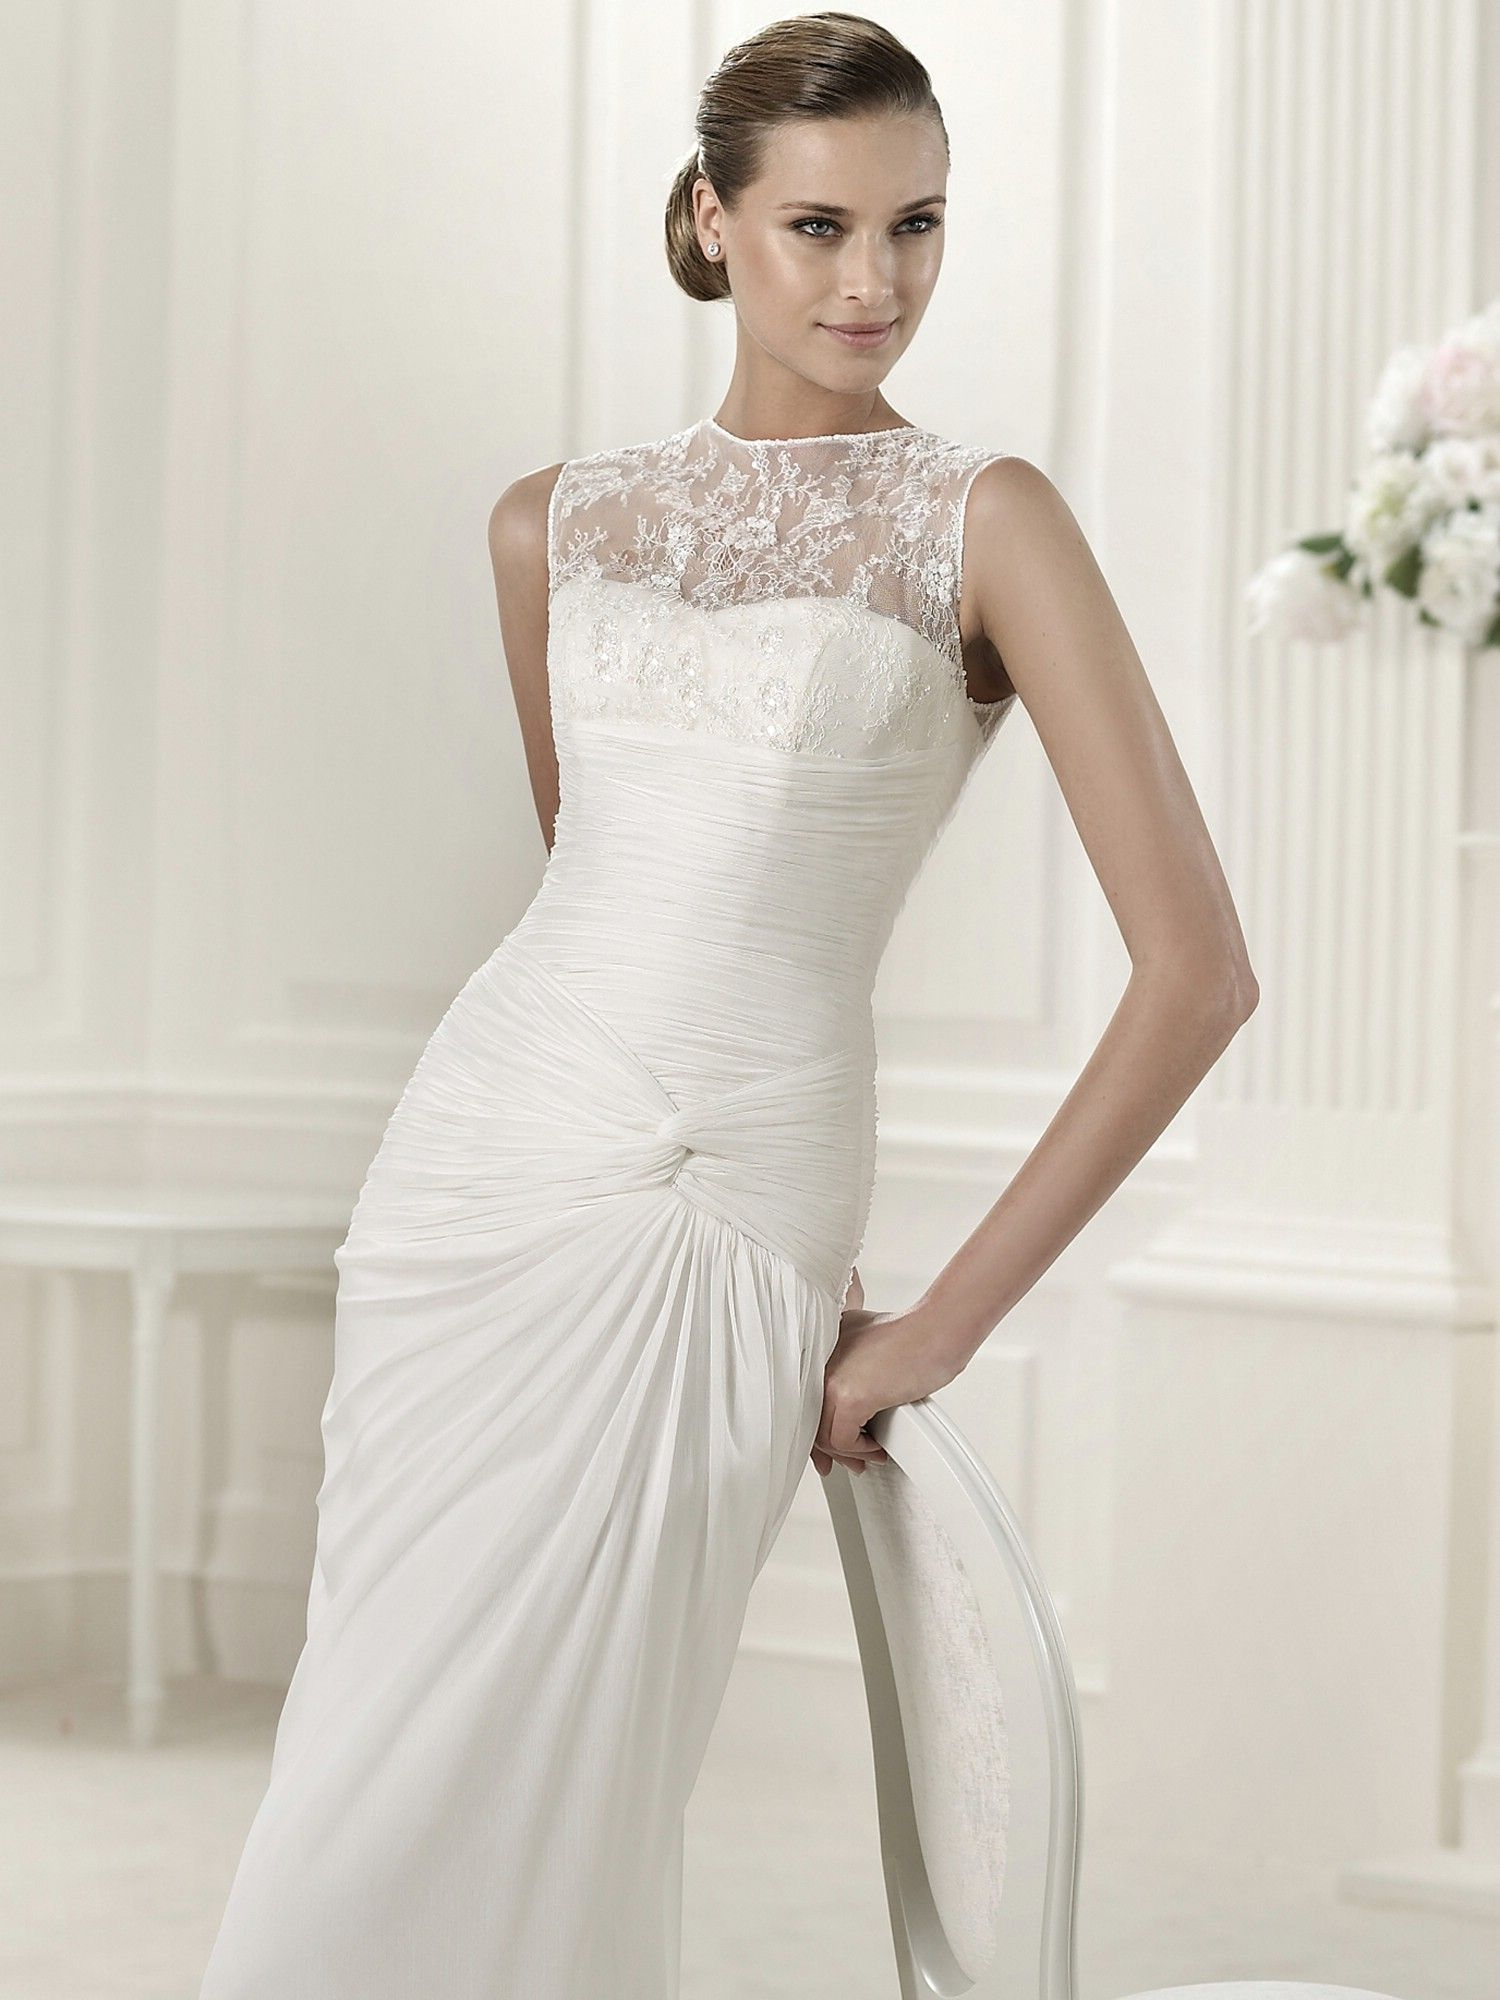 Buy Wedding Dress Pronovias Destino 2013 At Cheap Price